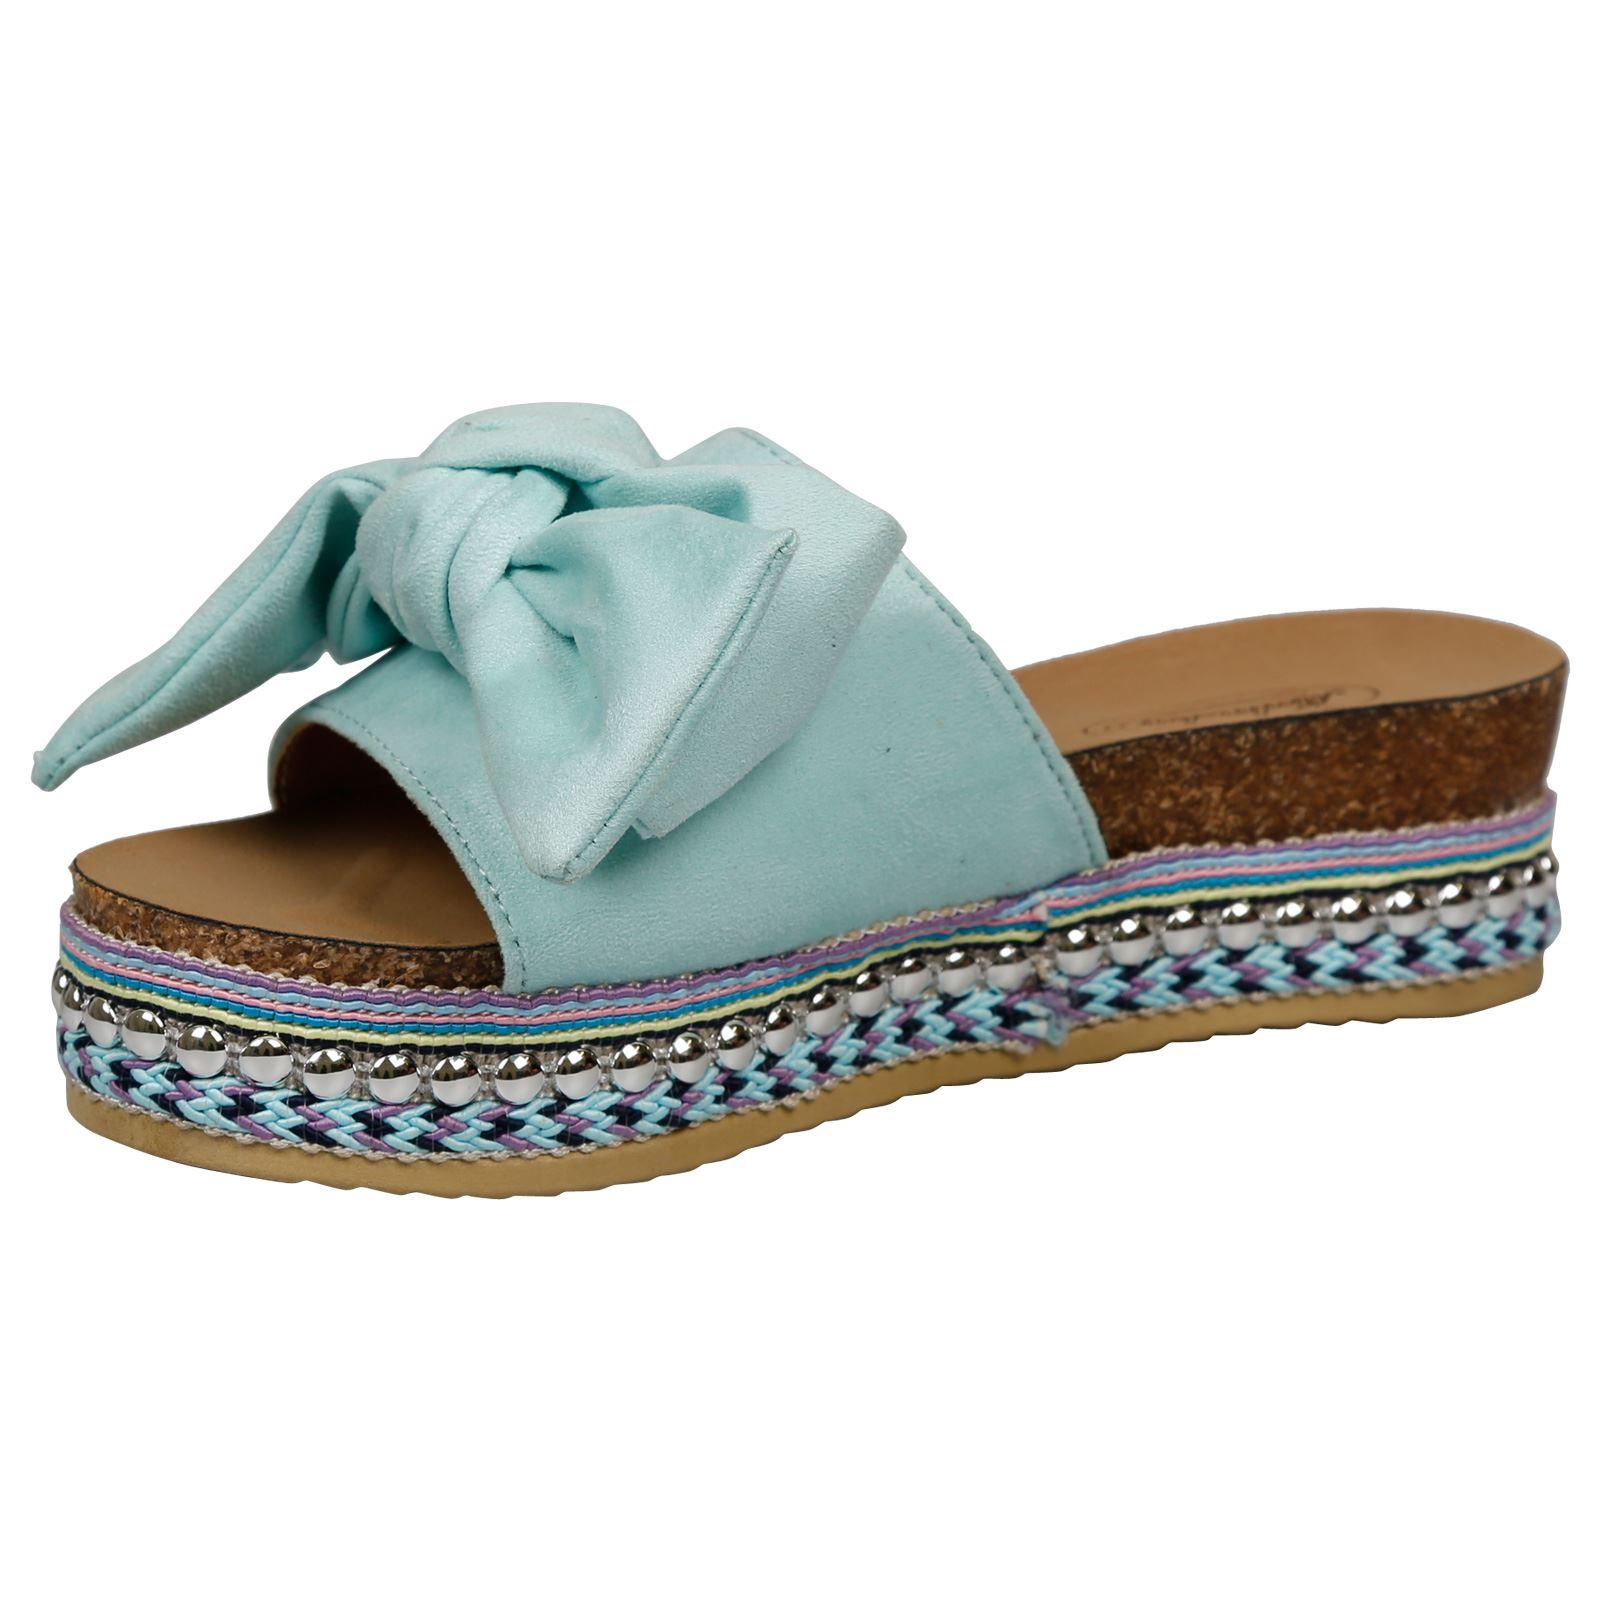 13231a2f8 Kirby Womens Flats Platforms Studded Boho Open Toe Sandals Ladies ...